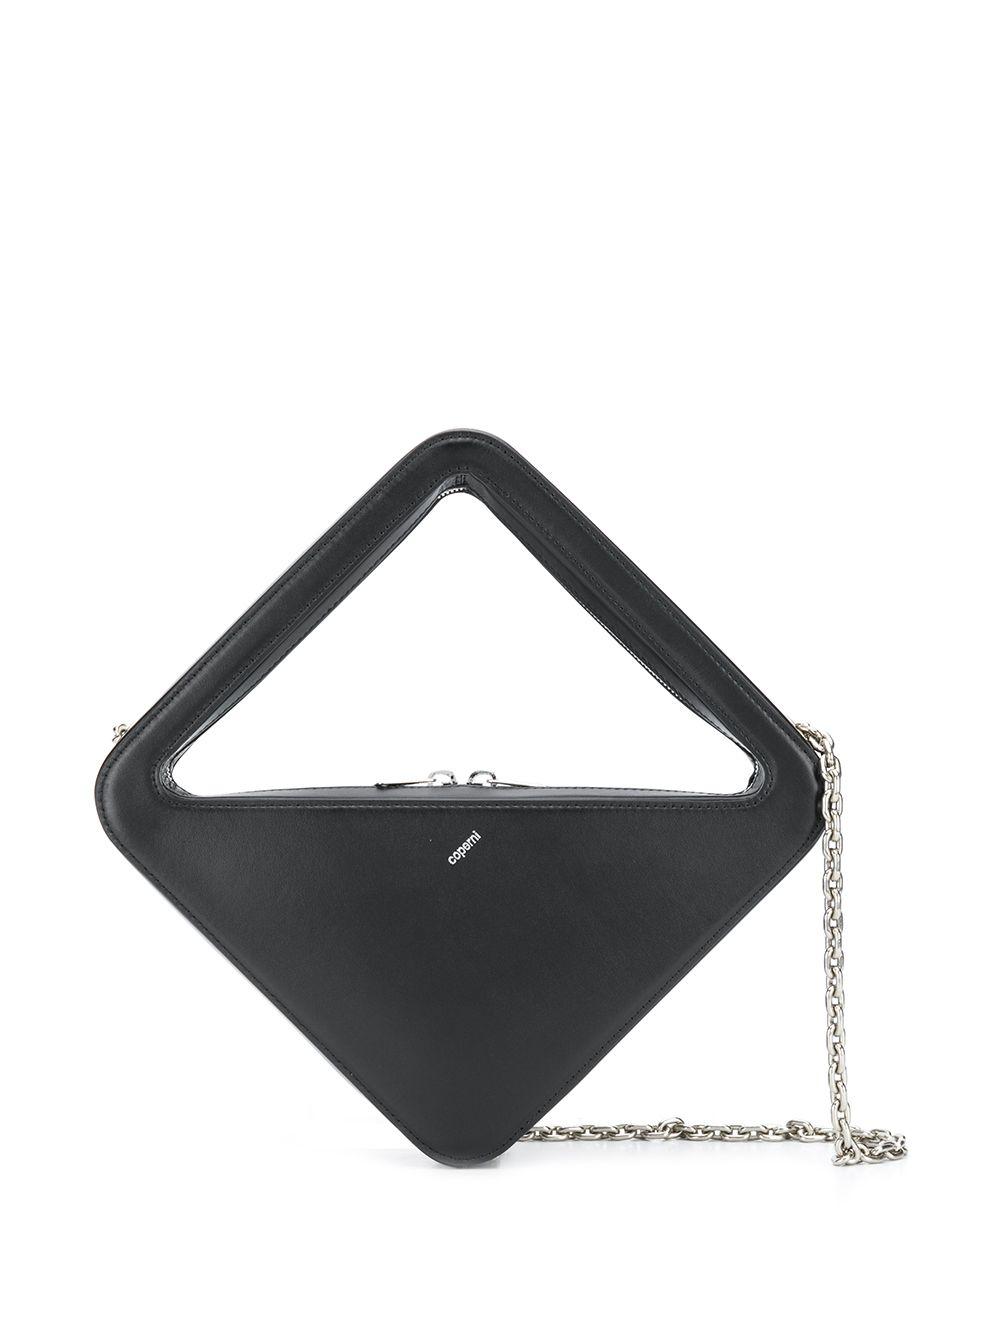 App Leather Handbag